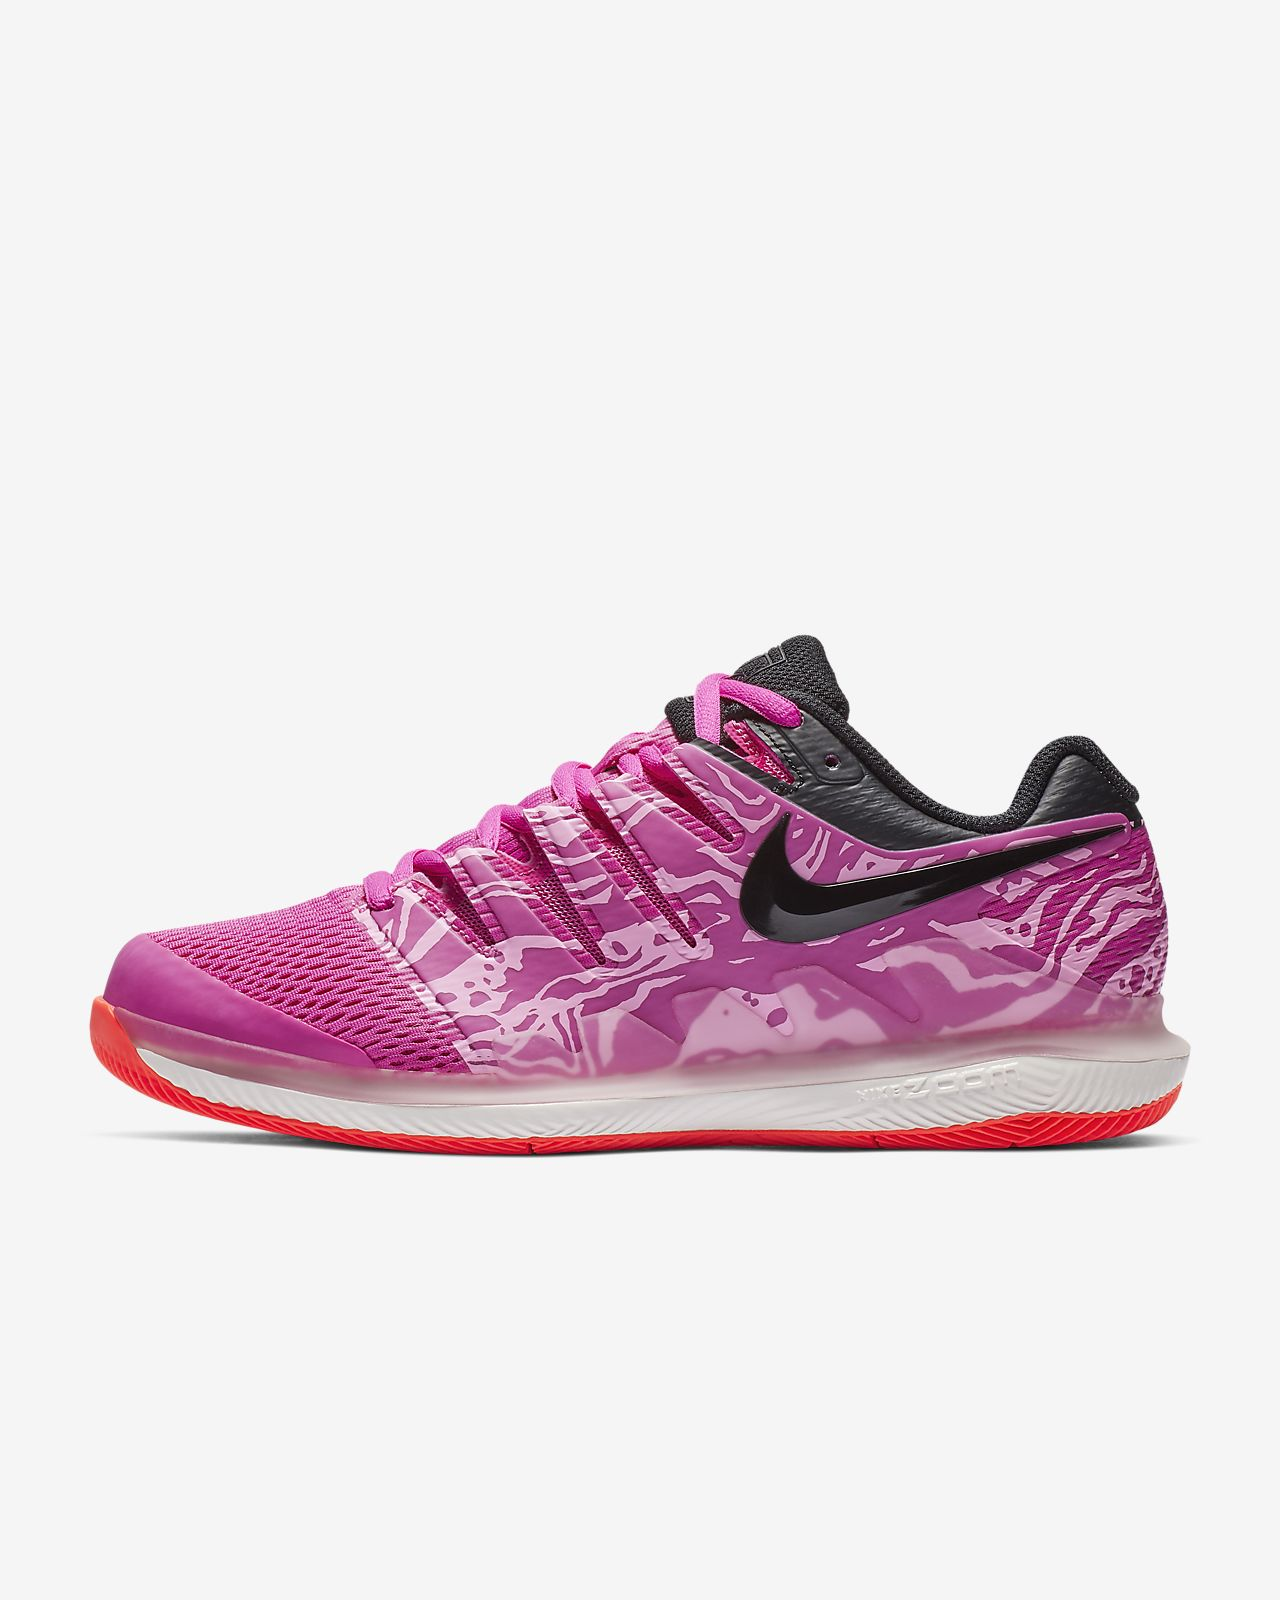 buy popular 6256c 45663 NikeCourt Air Zoom Vapor X-hardcourt-tennissko til kvinder